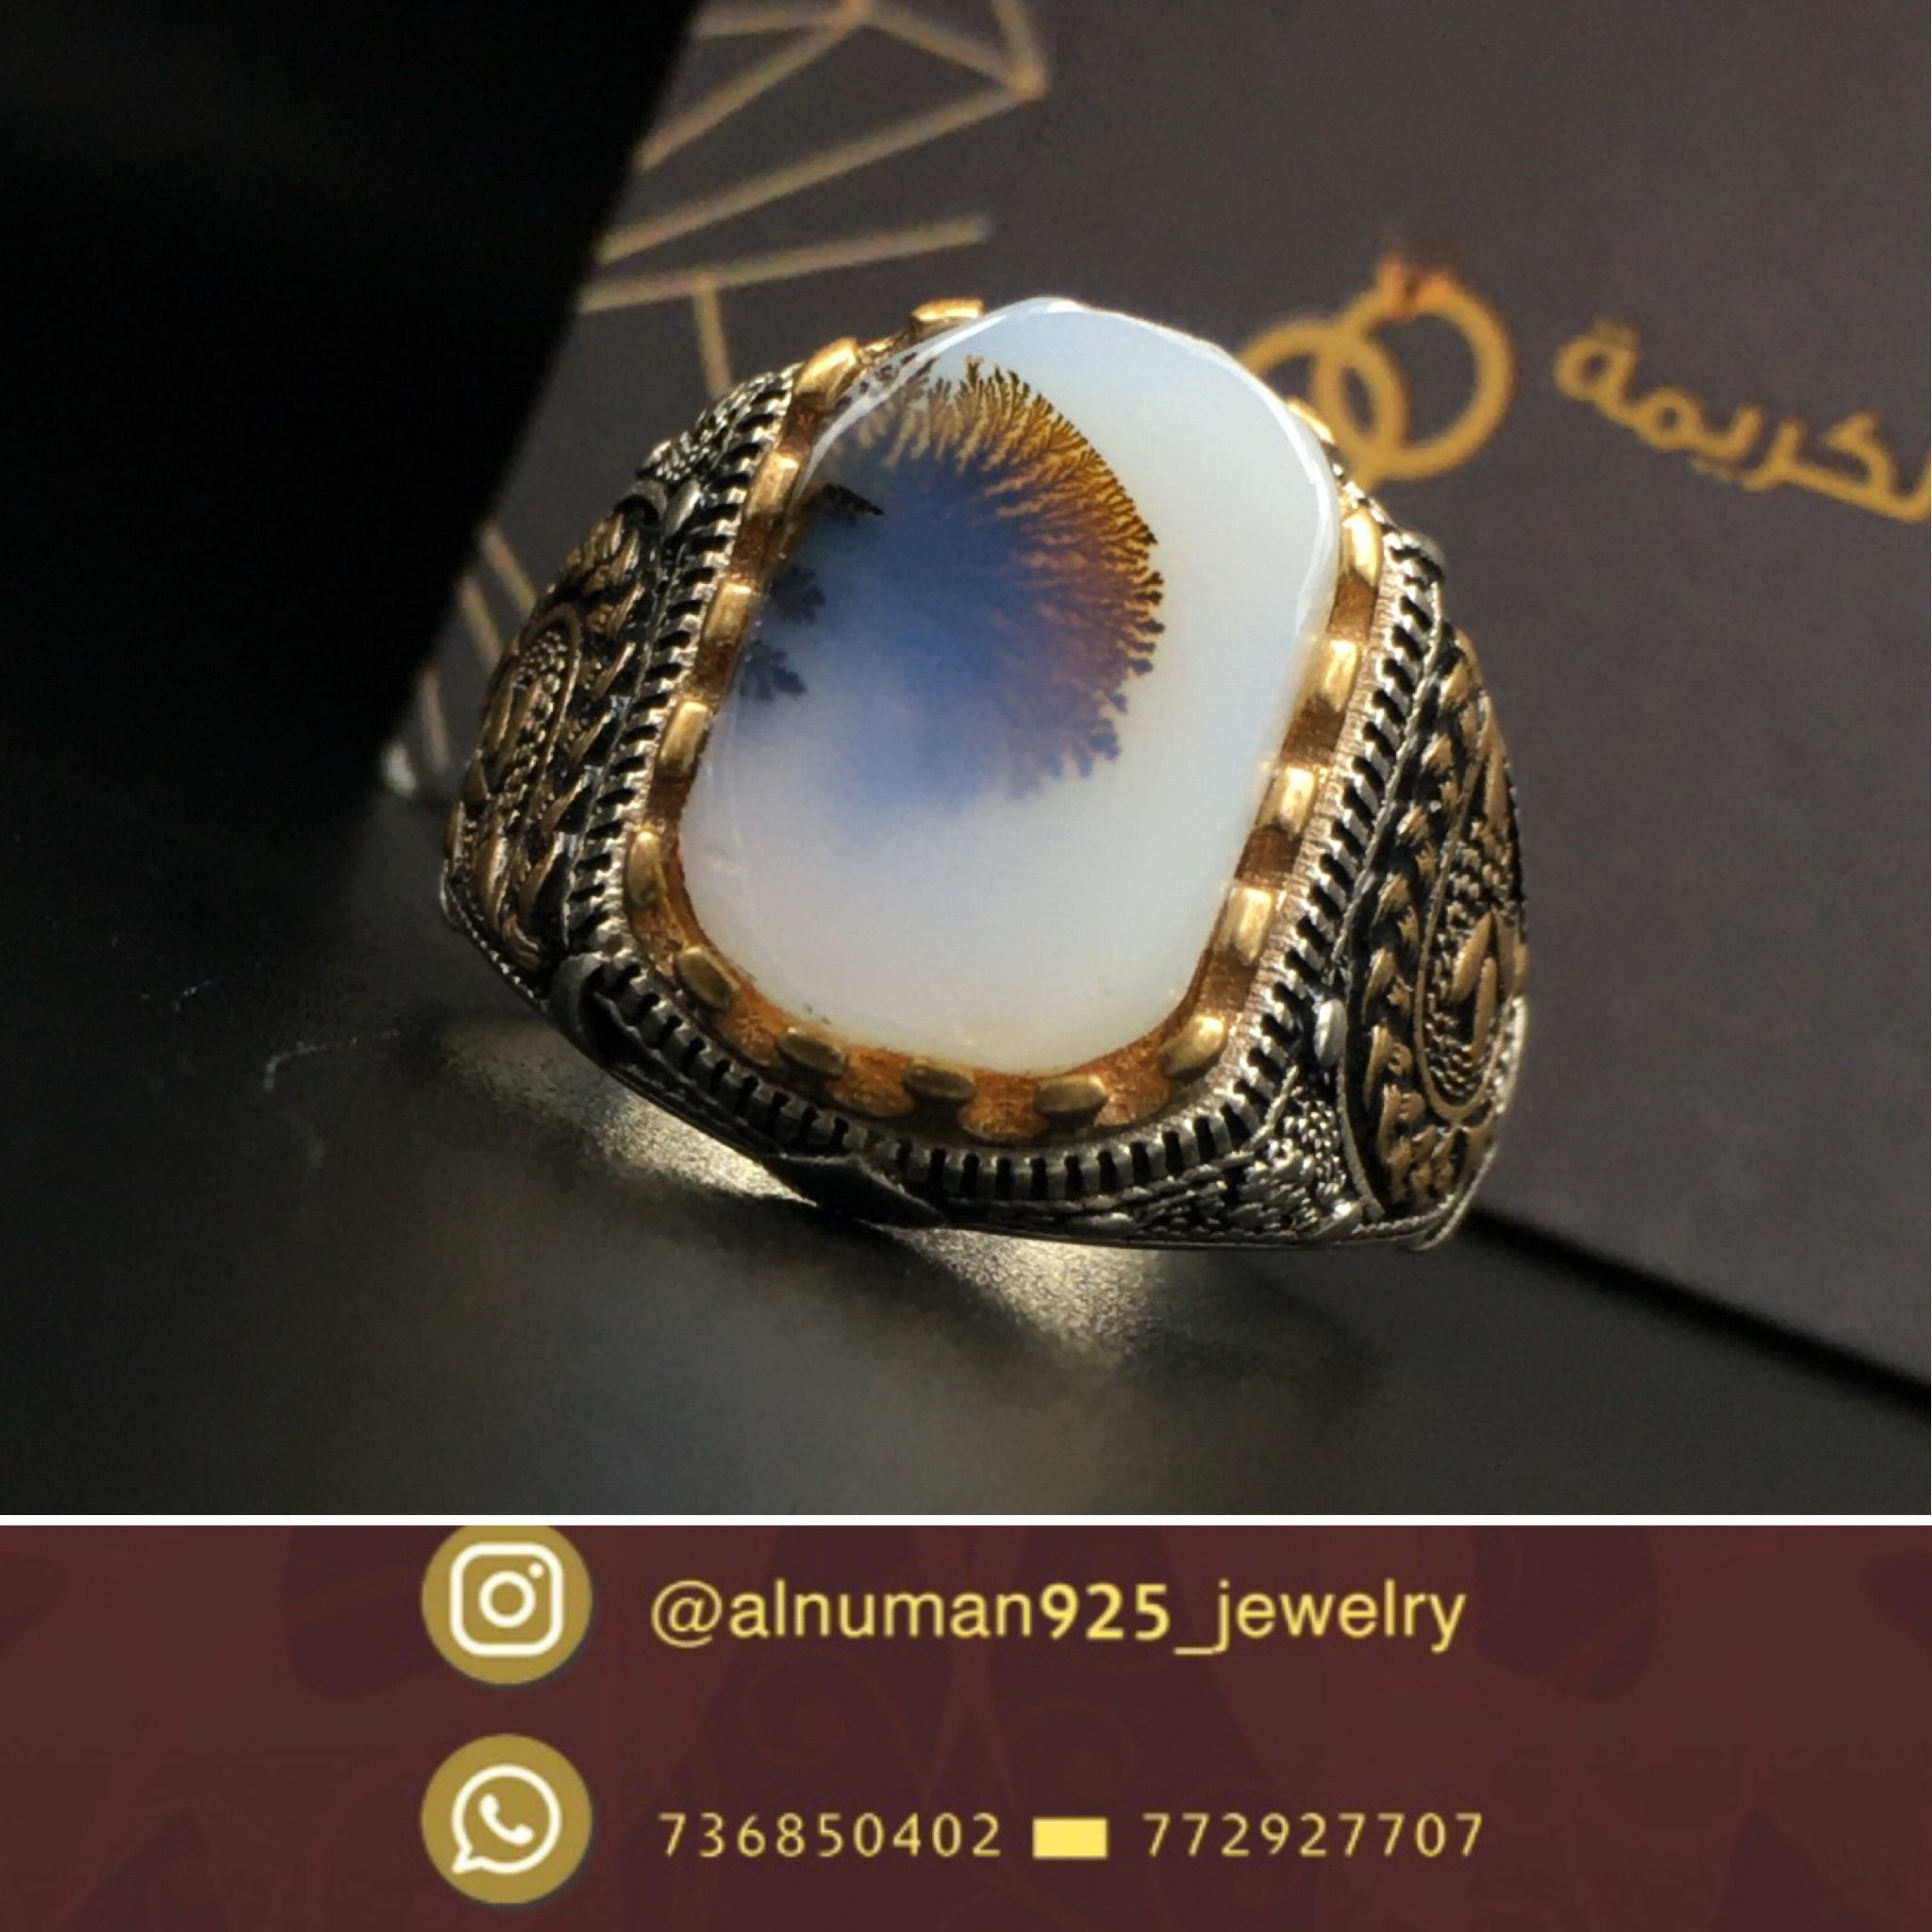 خاتم رجالي فضة عقيق يماني اصلي مشجر صنعاء خواتم Gemstone Rings Jewelry Gemstones